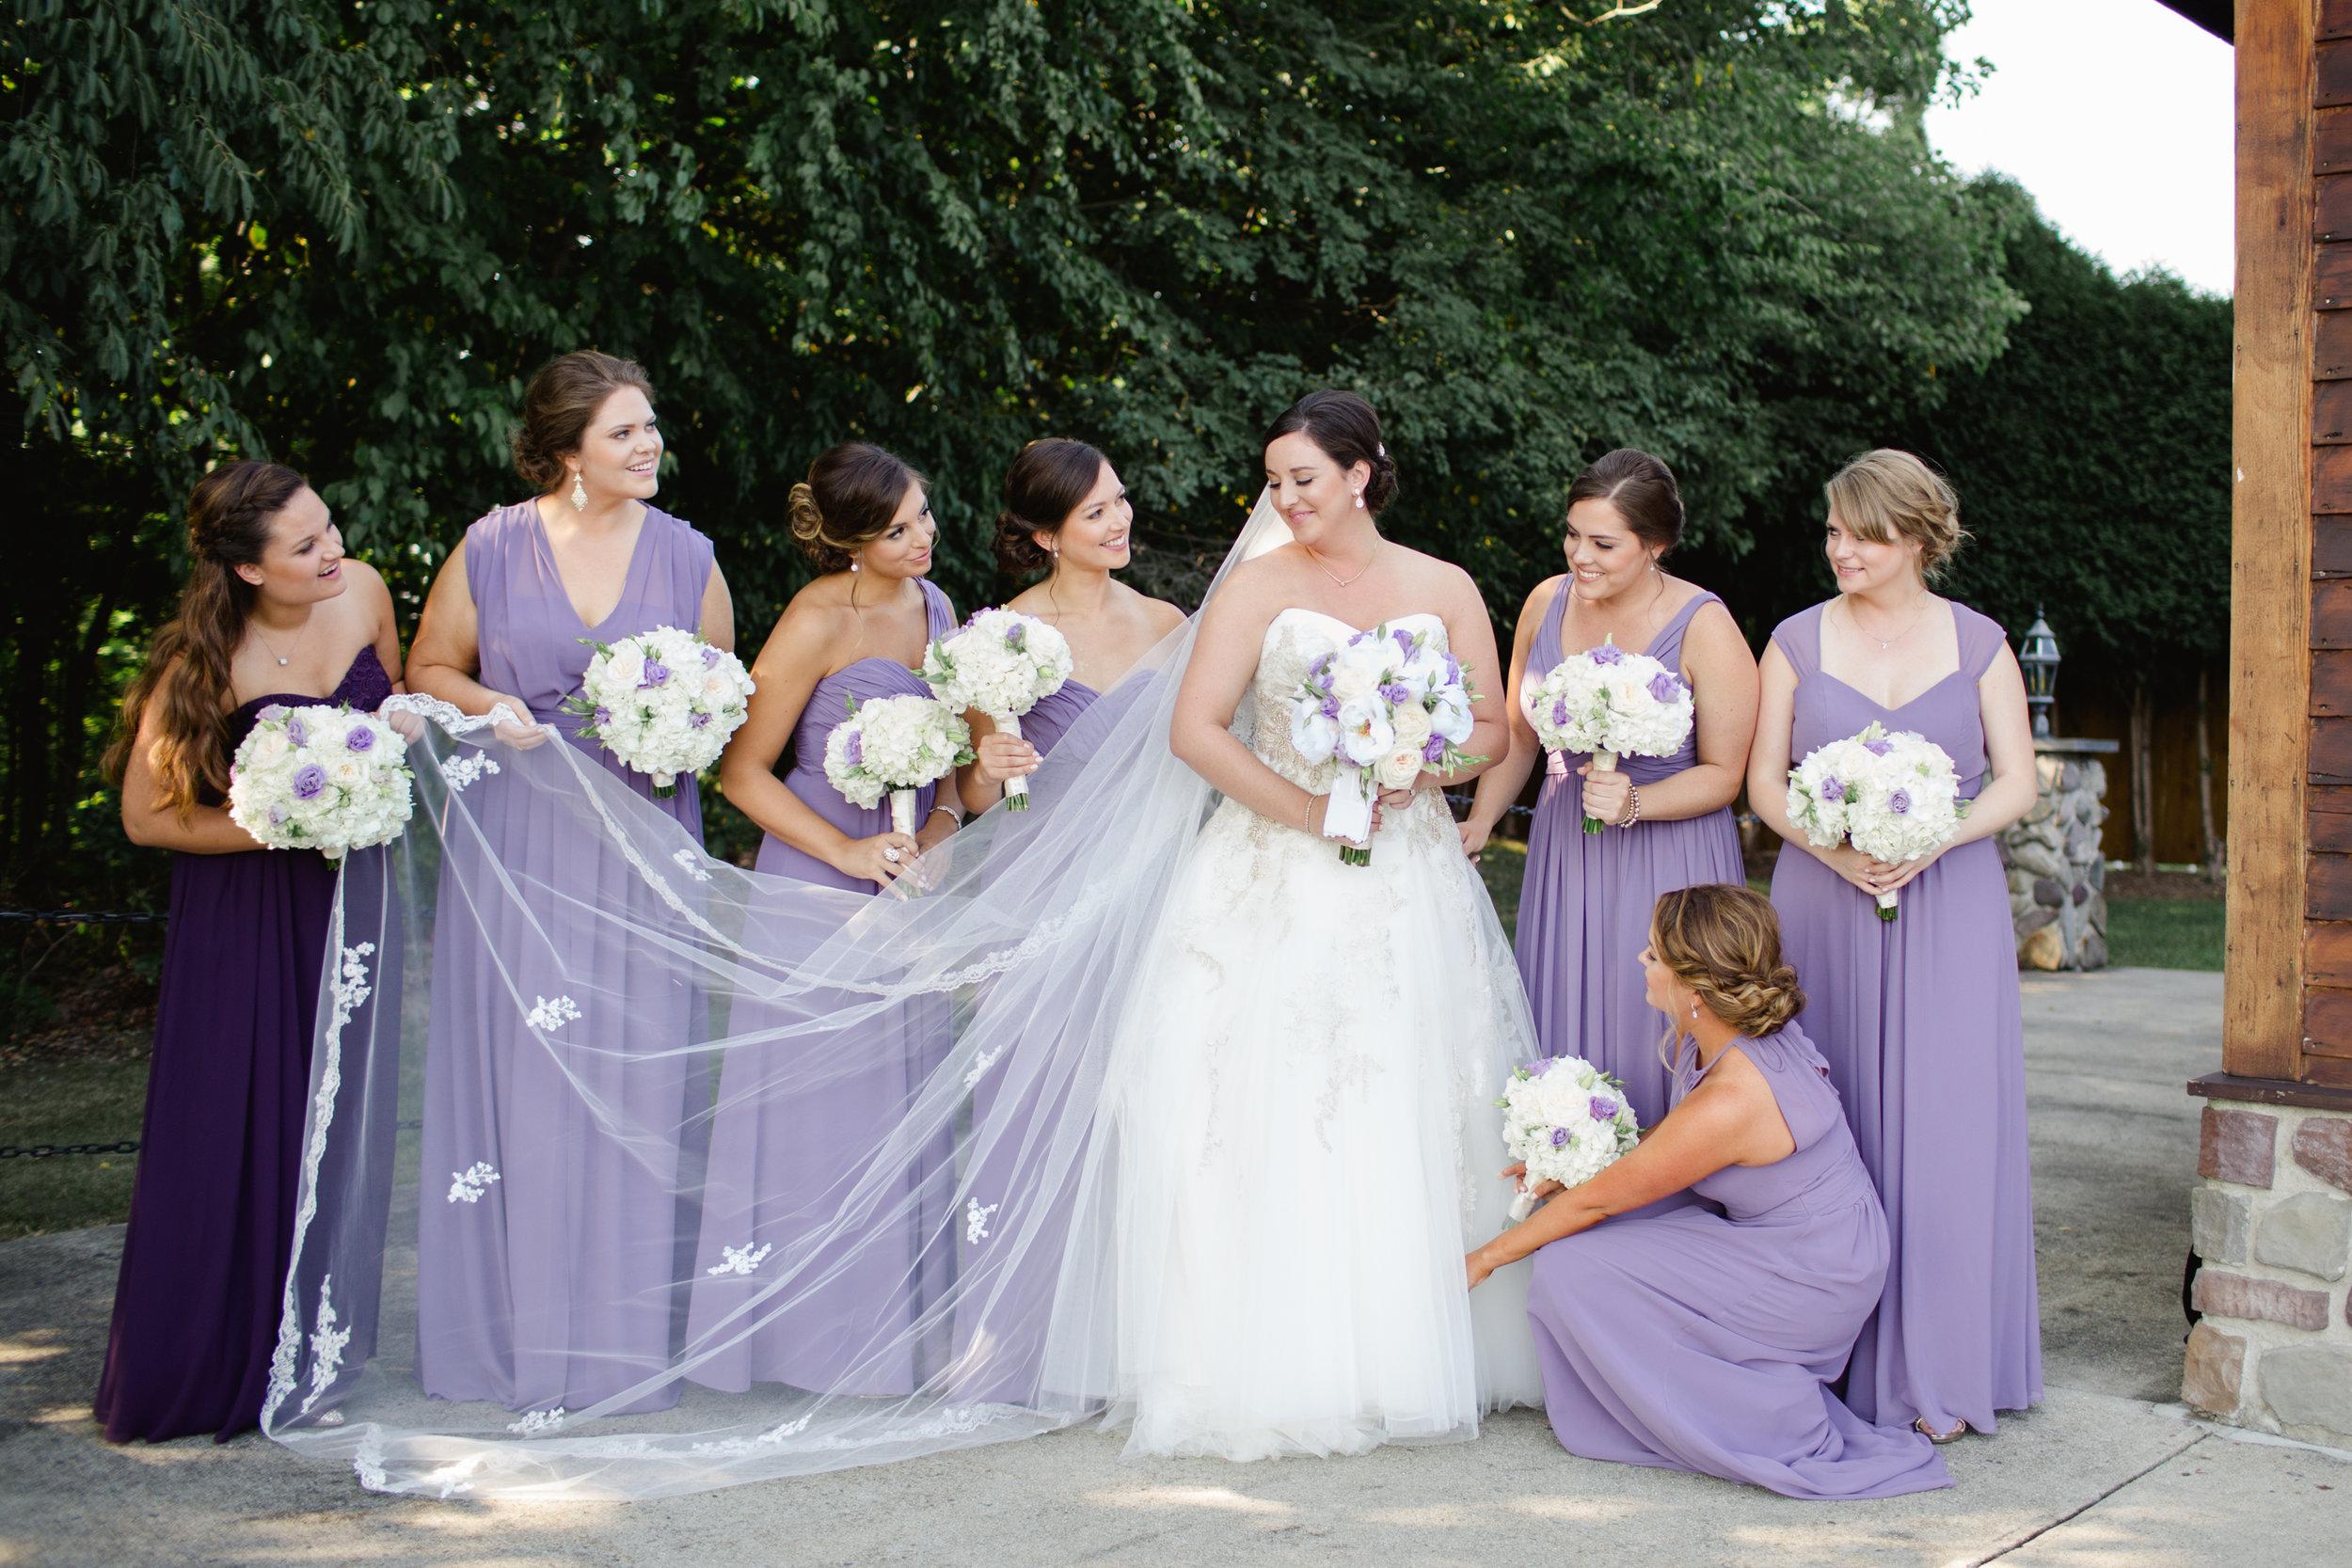 Scranton PA Lawnhaven Stroudsmoor Wedding Photography_JDP-0342.jpg